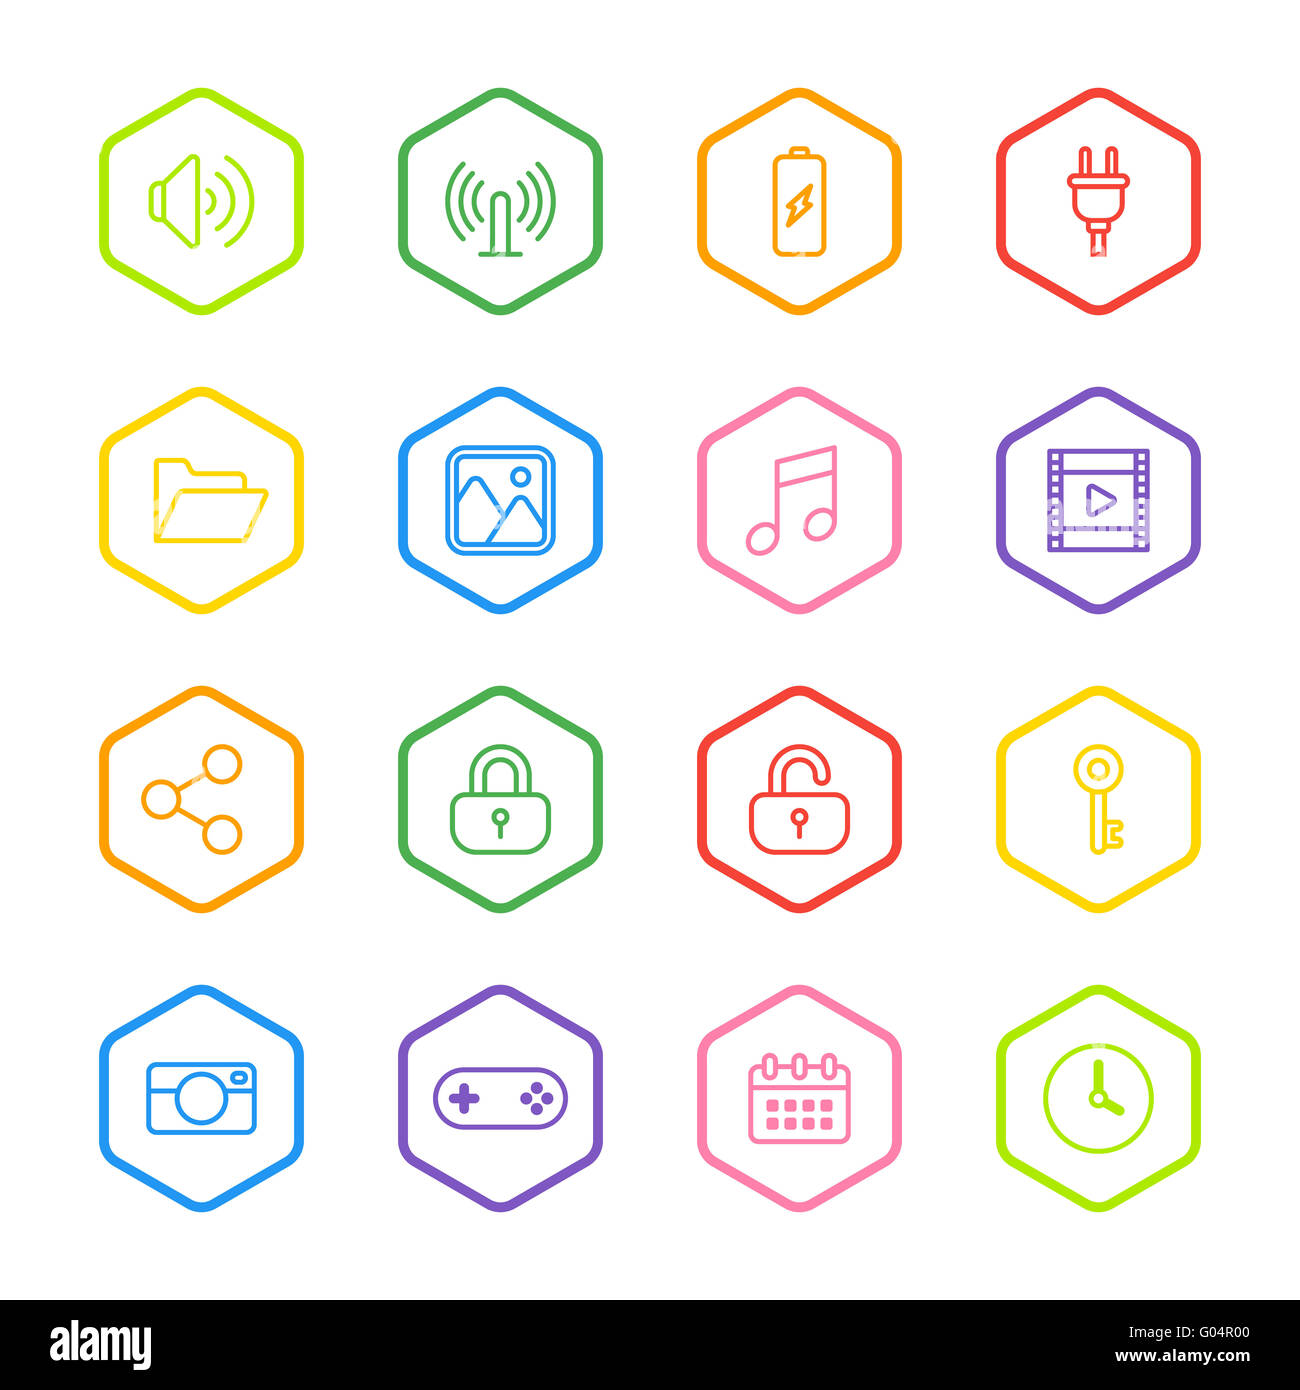 JPEG] colorful line web icon set with hexagon frame for web, UI ...